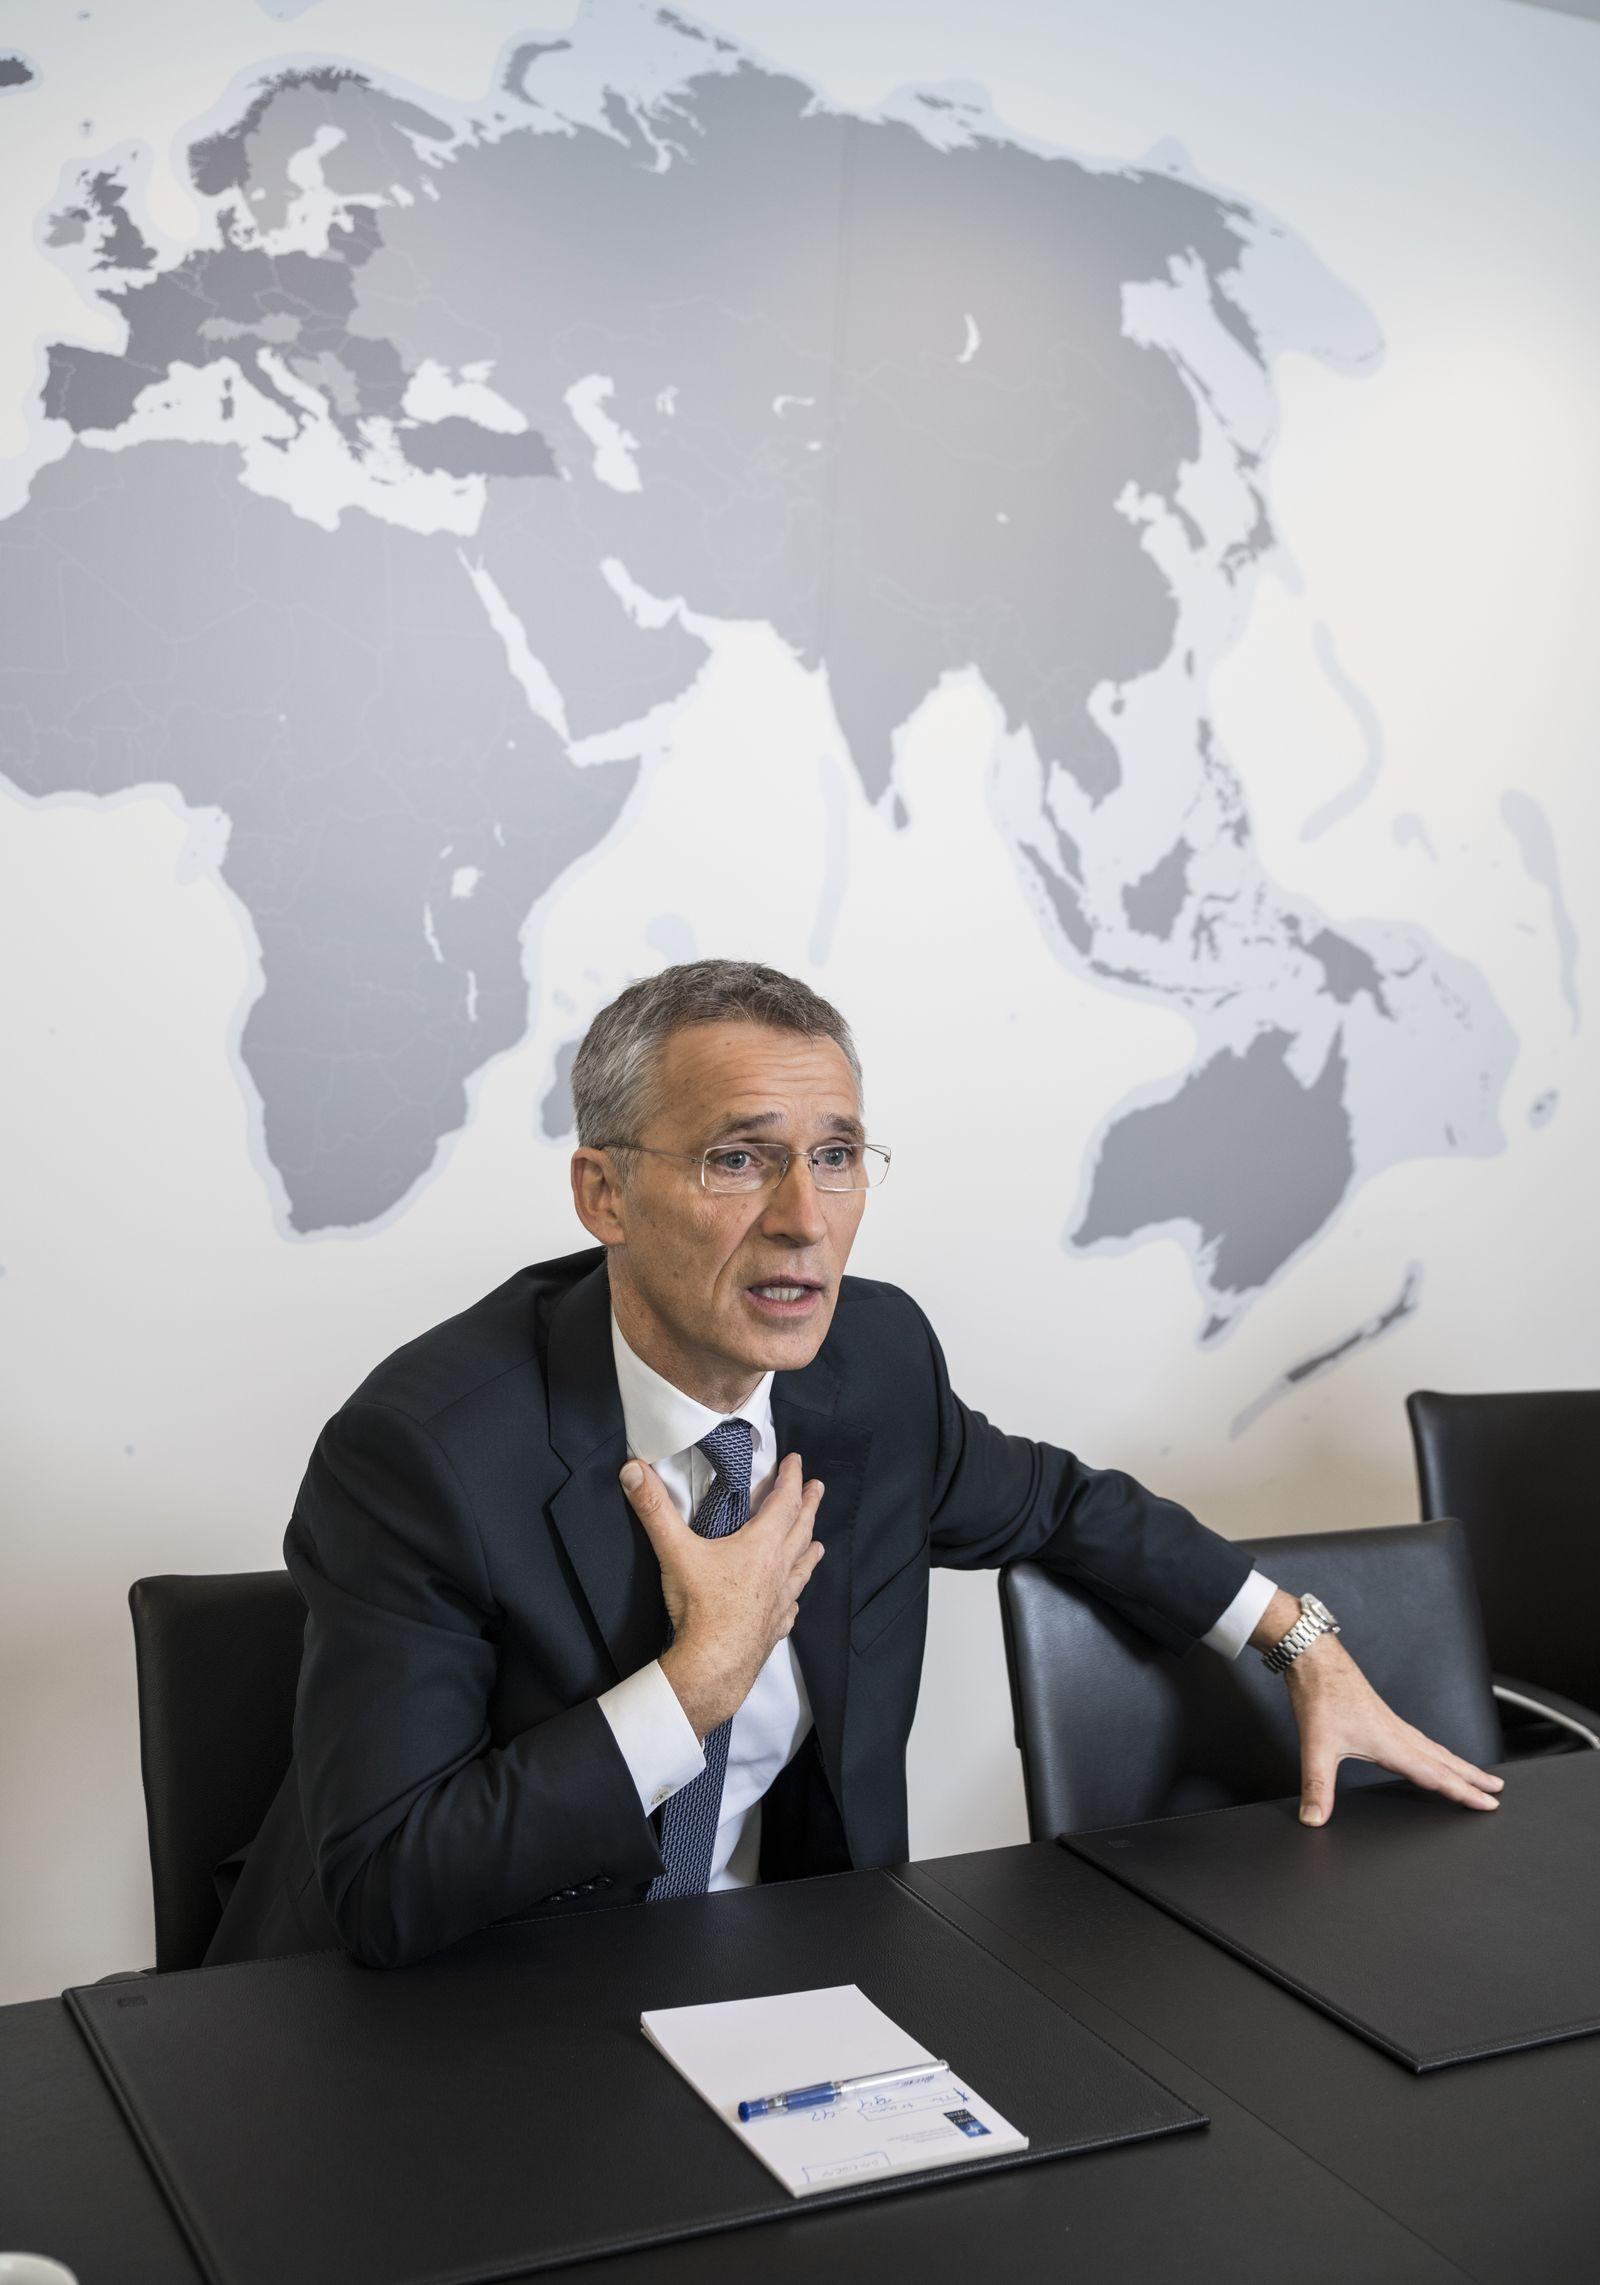 SP 14/2019 Jens Stoltenberg Nato-Generalsekretär S. 28